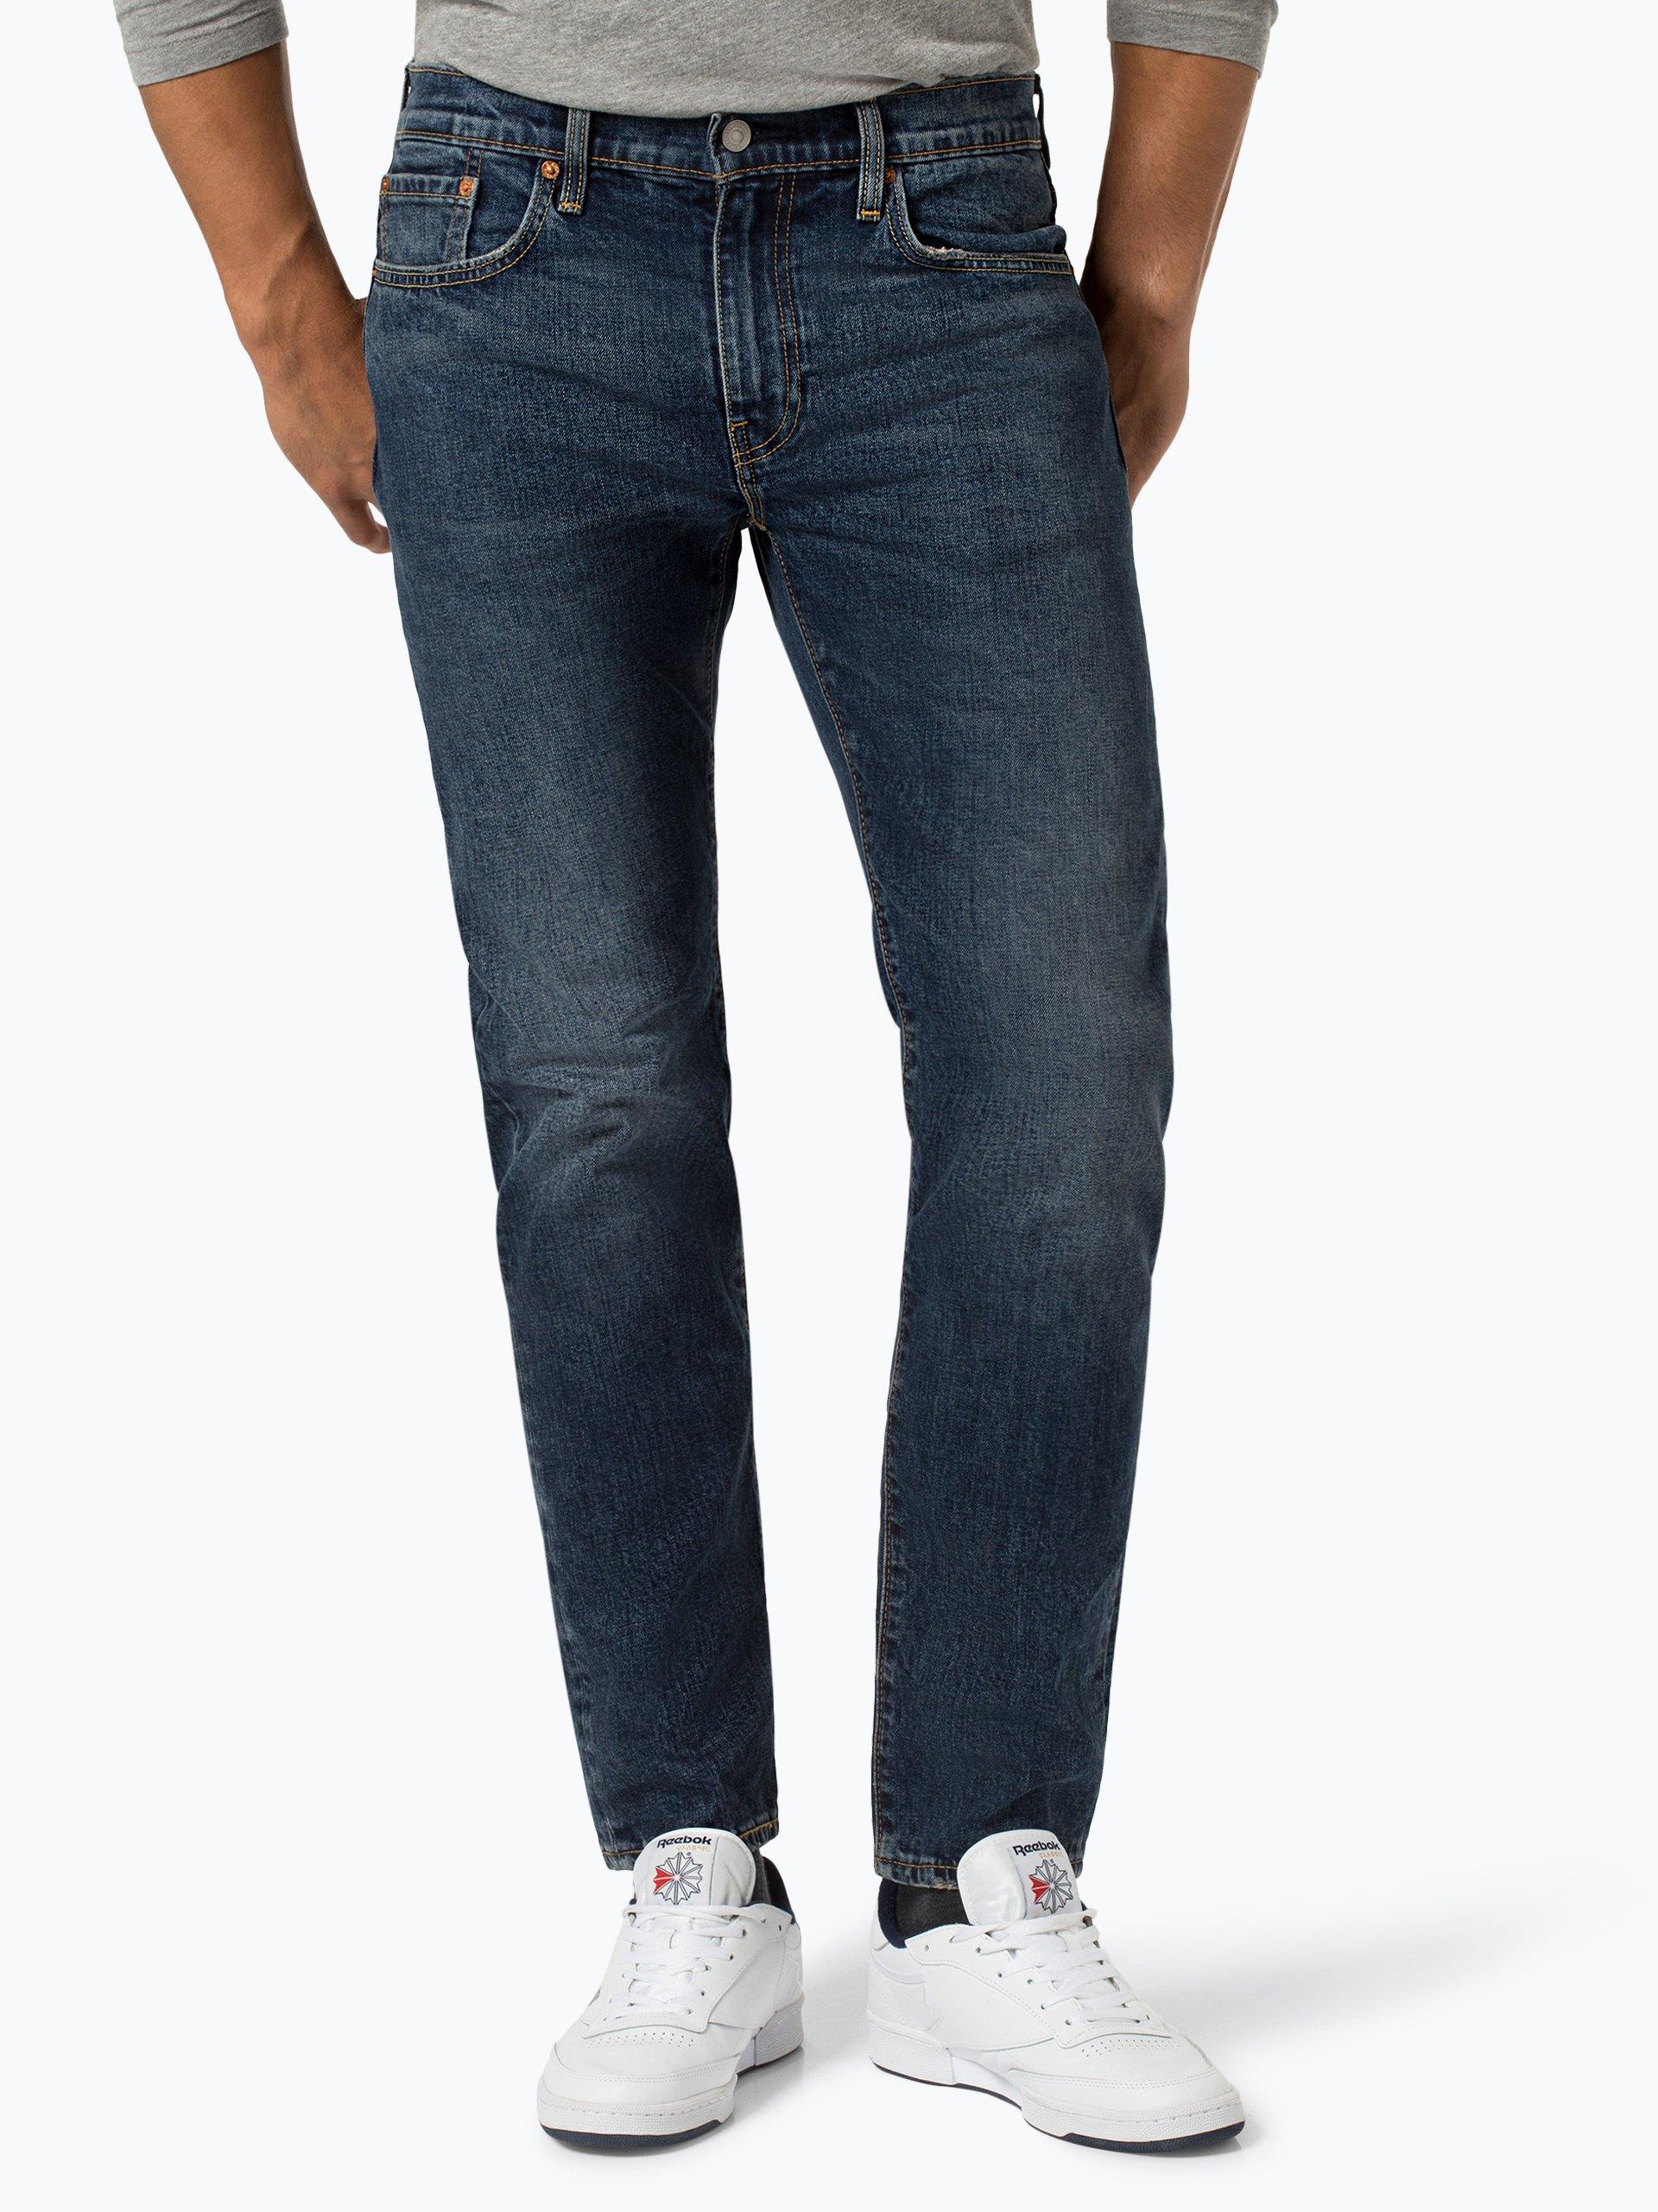 levi 39 s herren jeans 2 online kaufen peek und cloppenburg de. Black Bedroom Furniture Sets. Home Design Ideas